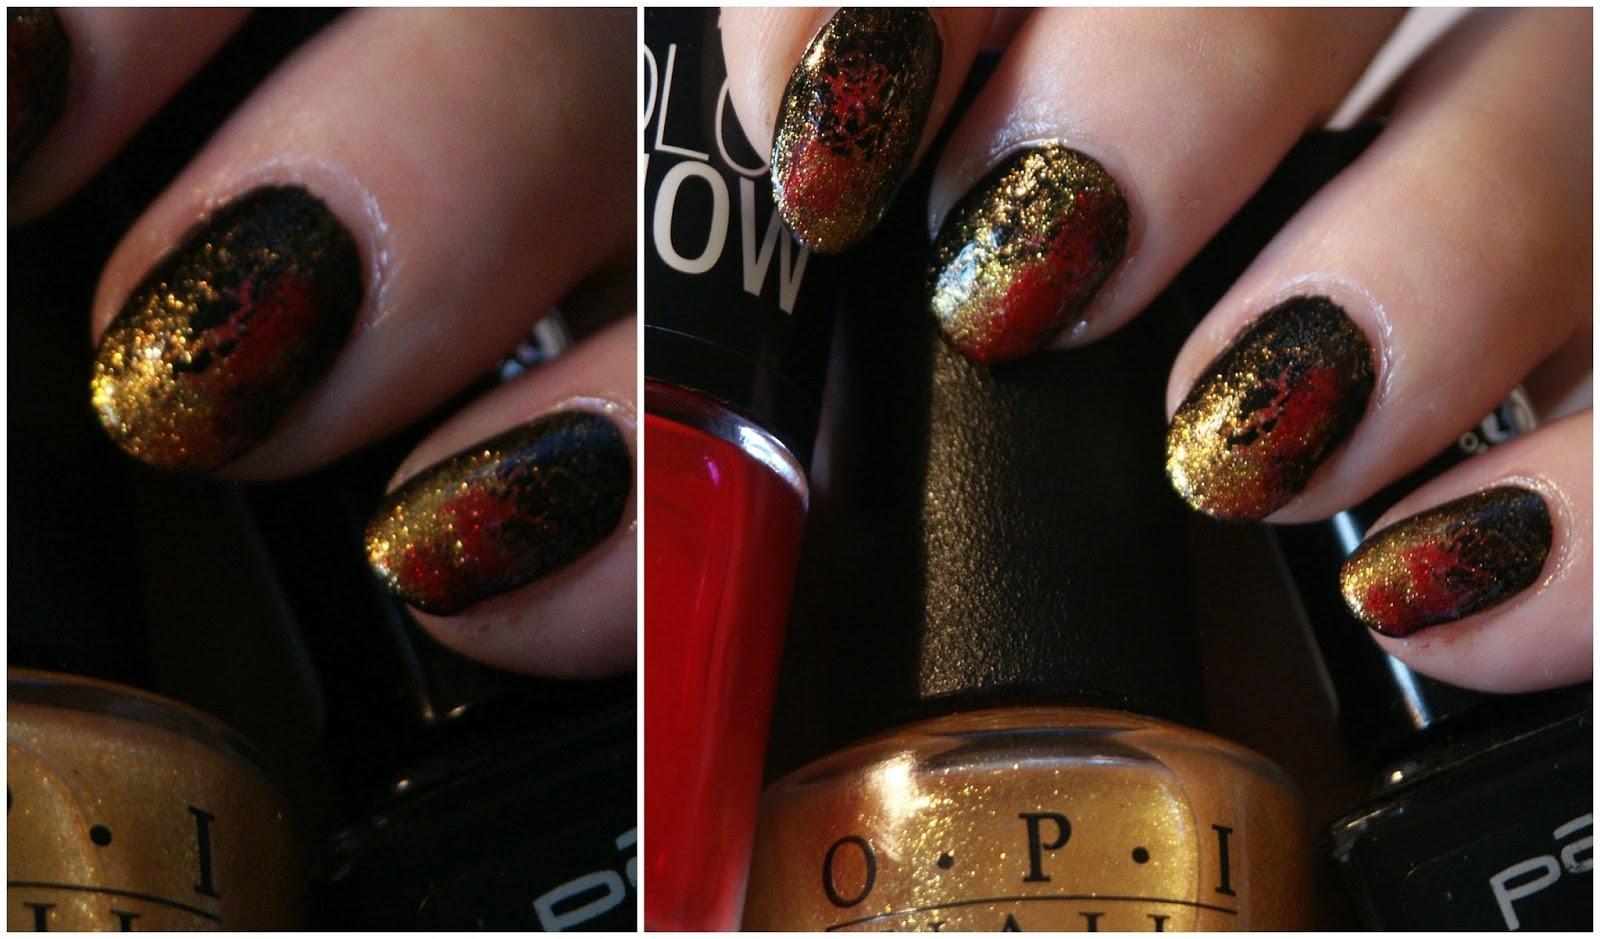 Germany, WM, Nails